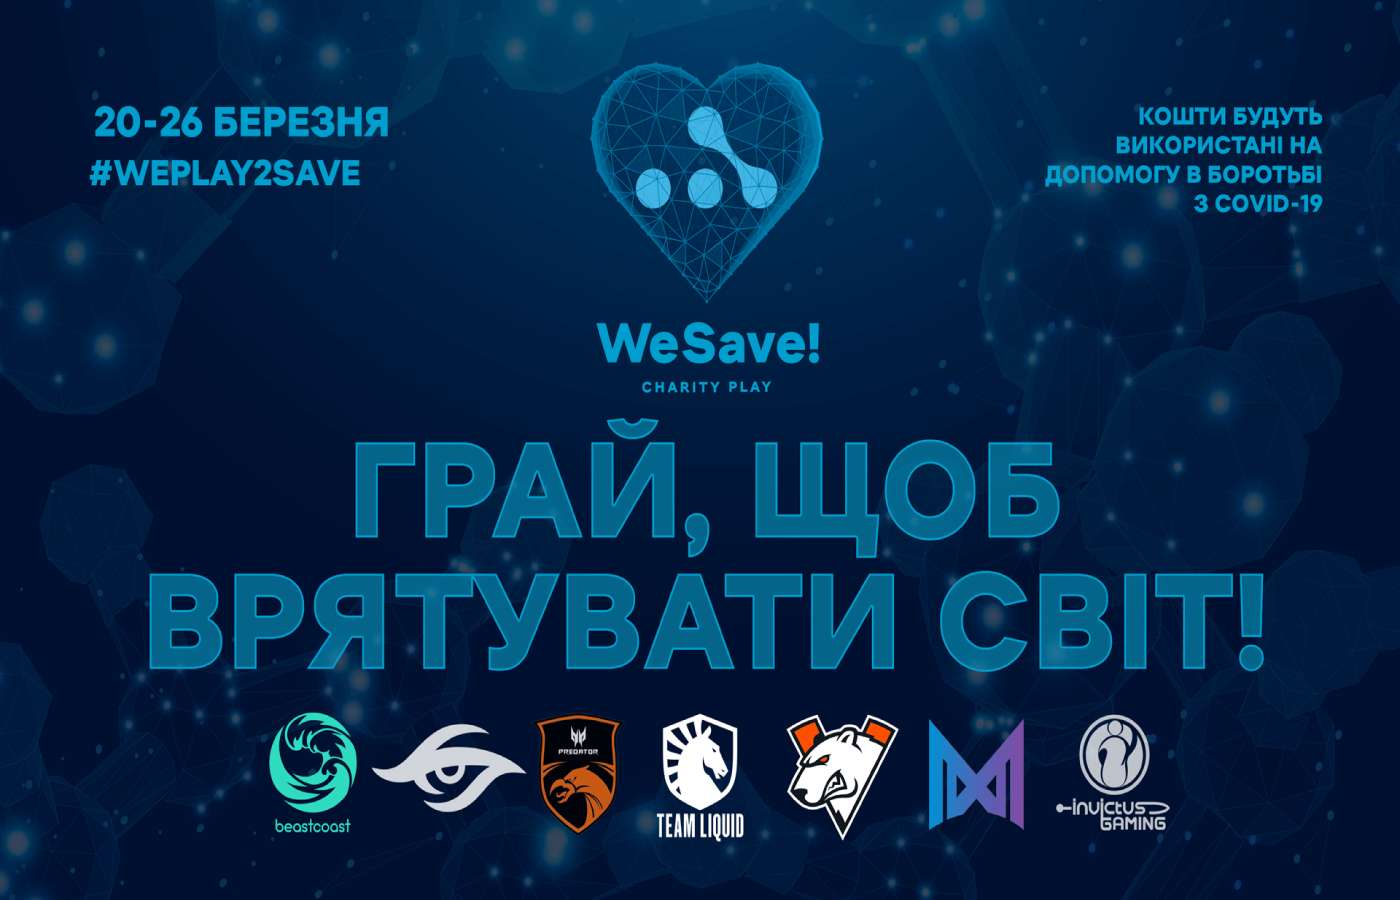 👾 Kibersportsmeny proveduť blagodijnyj turnir proty COVID-19 — WeSave! Charity Play